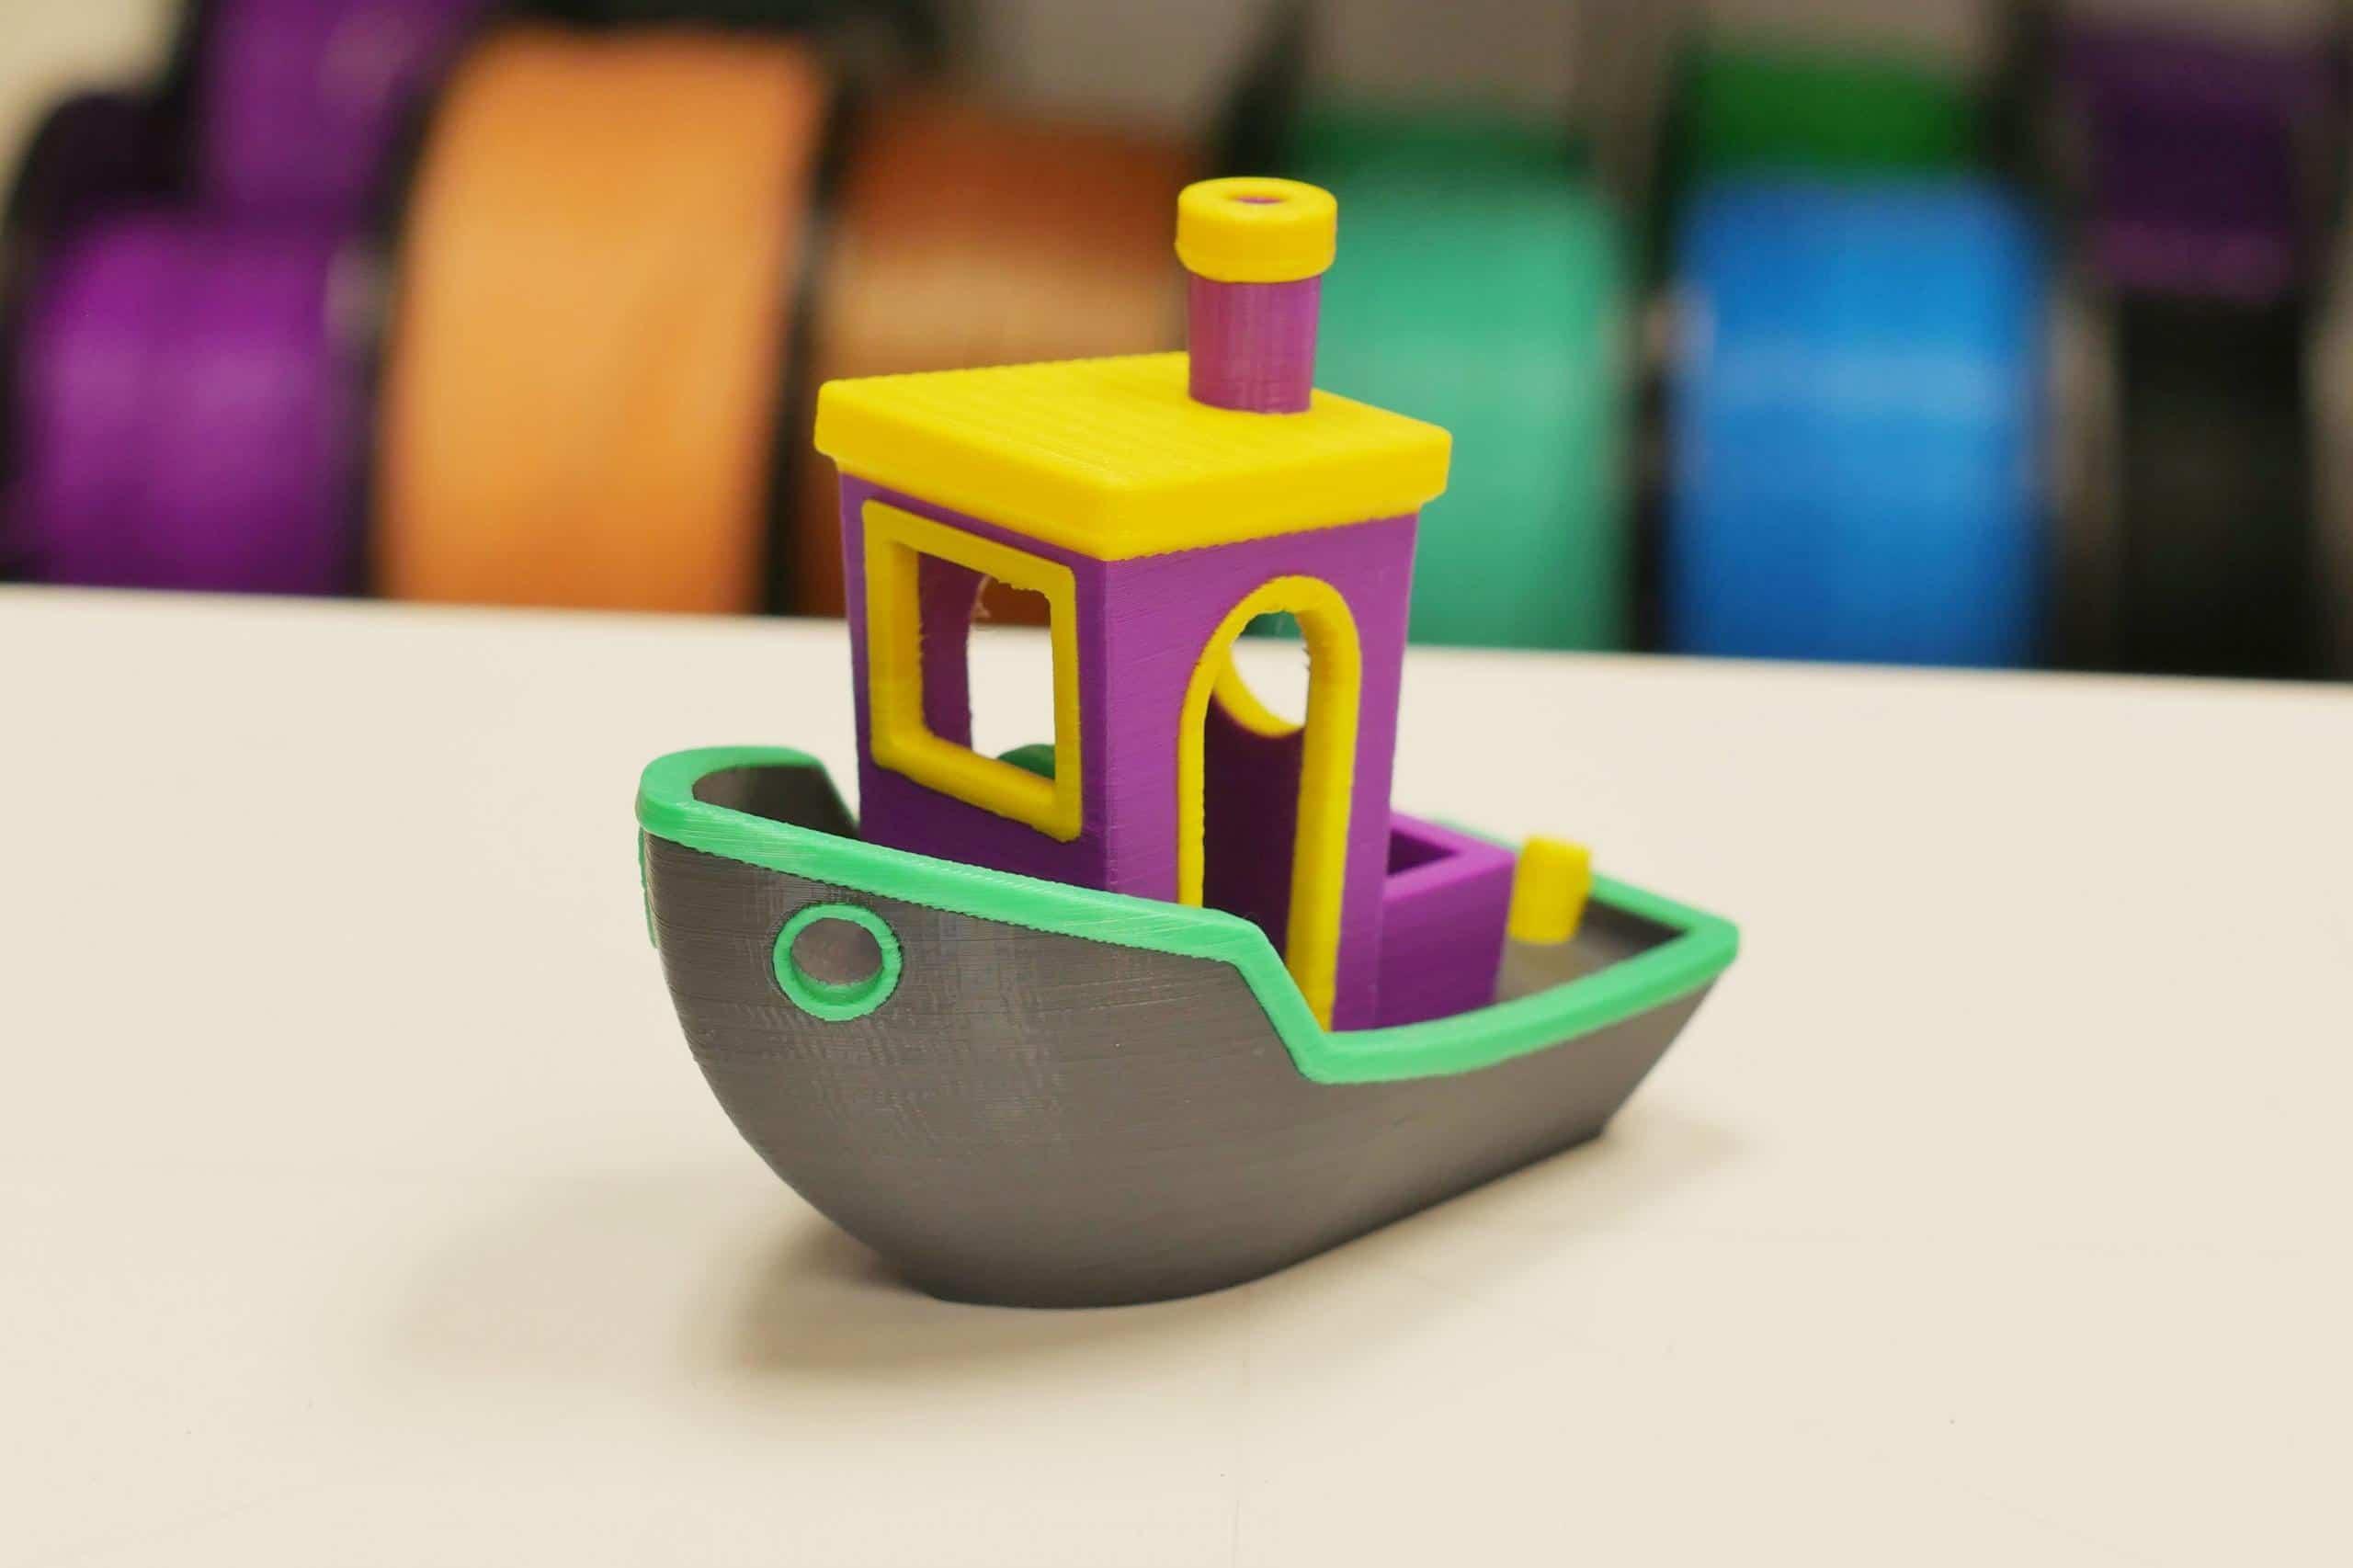 3D Printen - What is 3D printen learn more in 2021